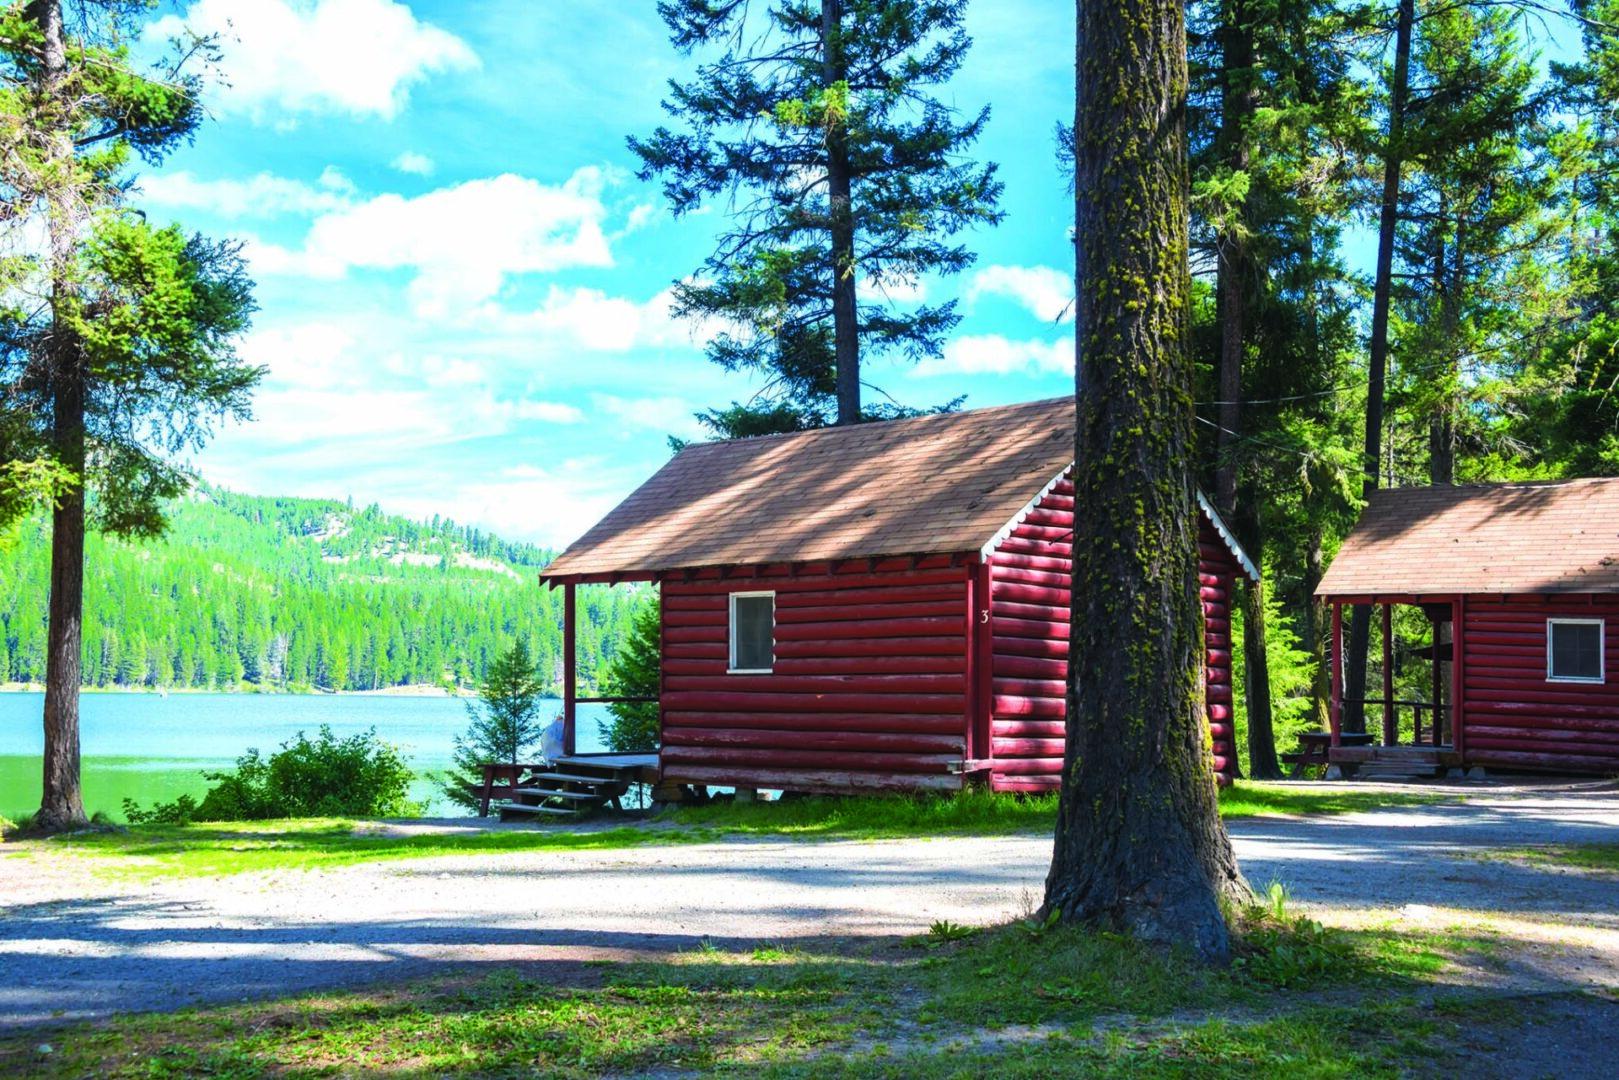 Lake Bonaparte Resort, WA 20130817 by Denise Lett